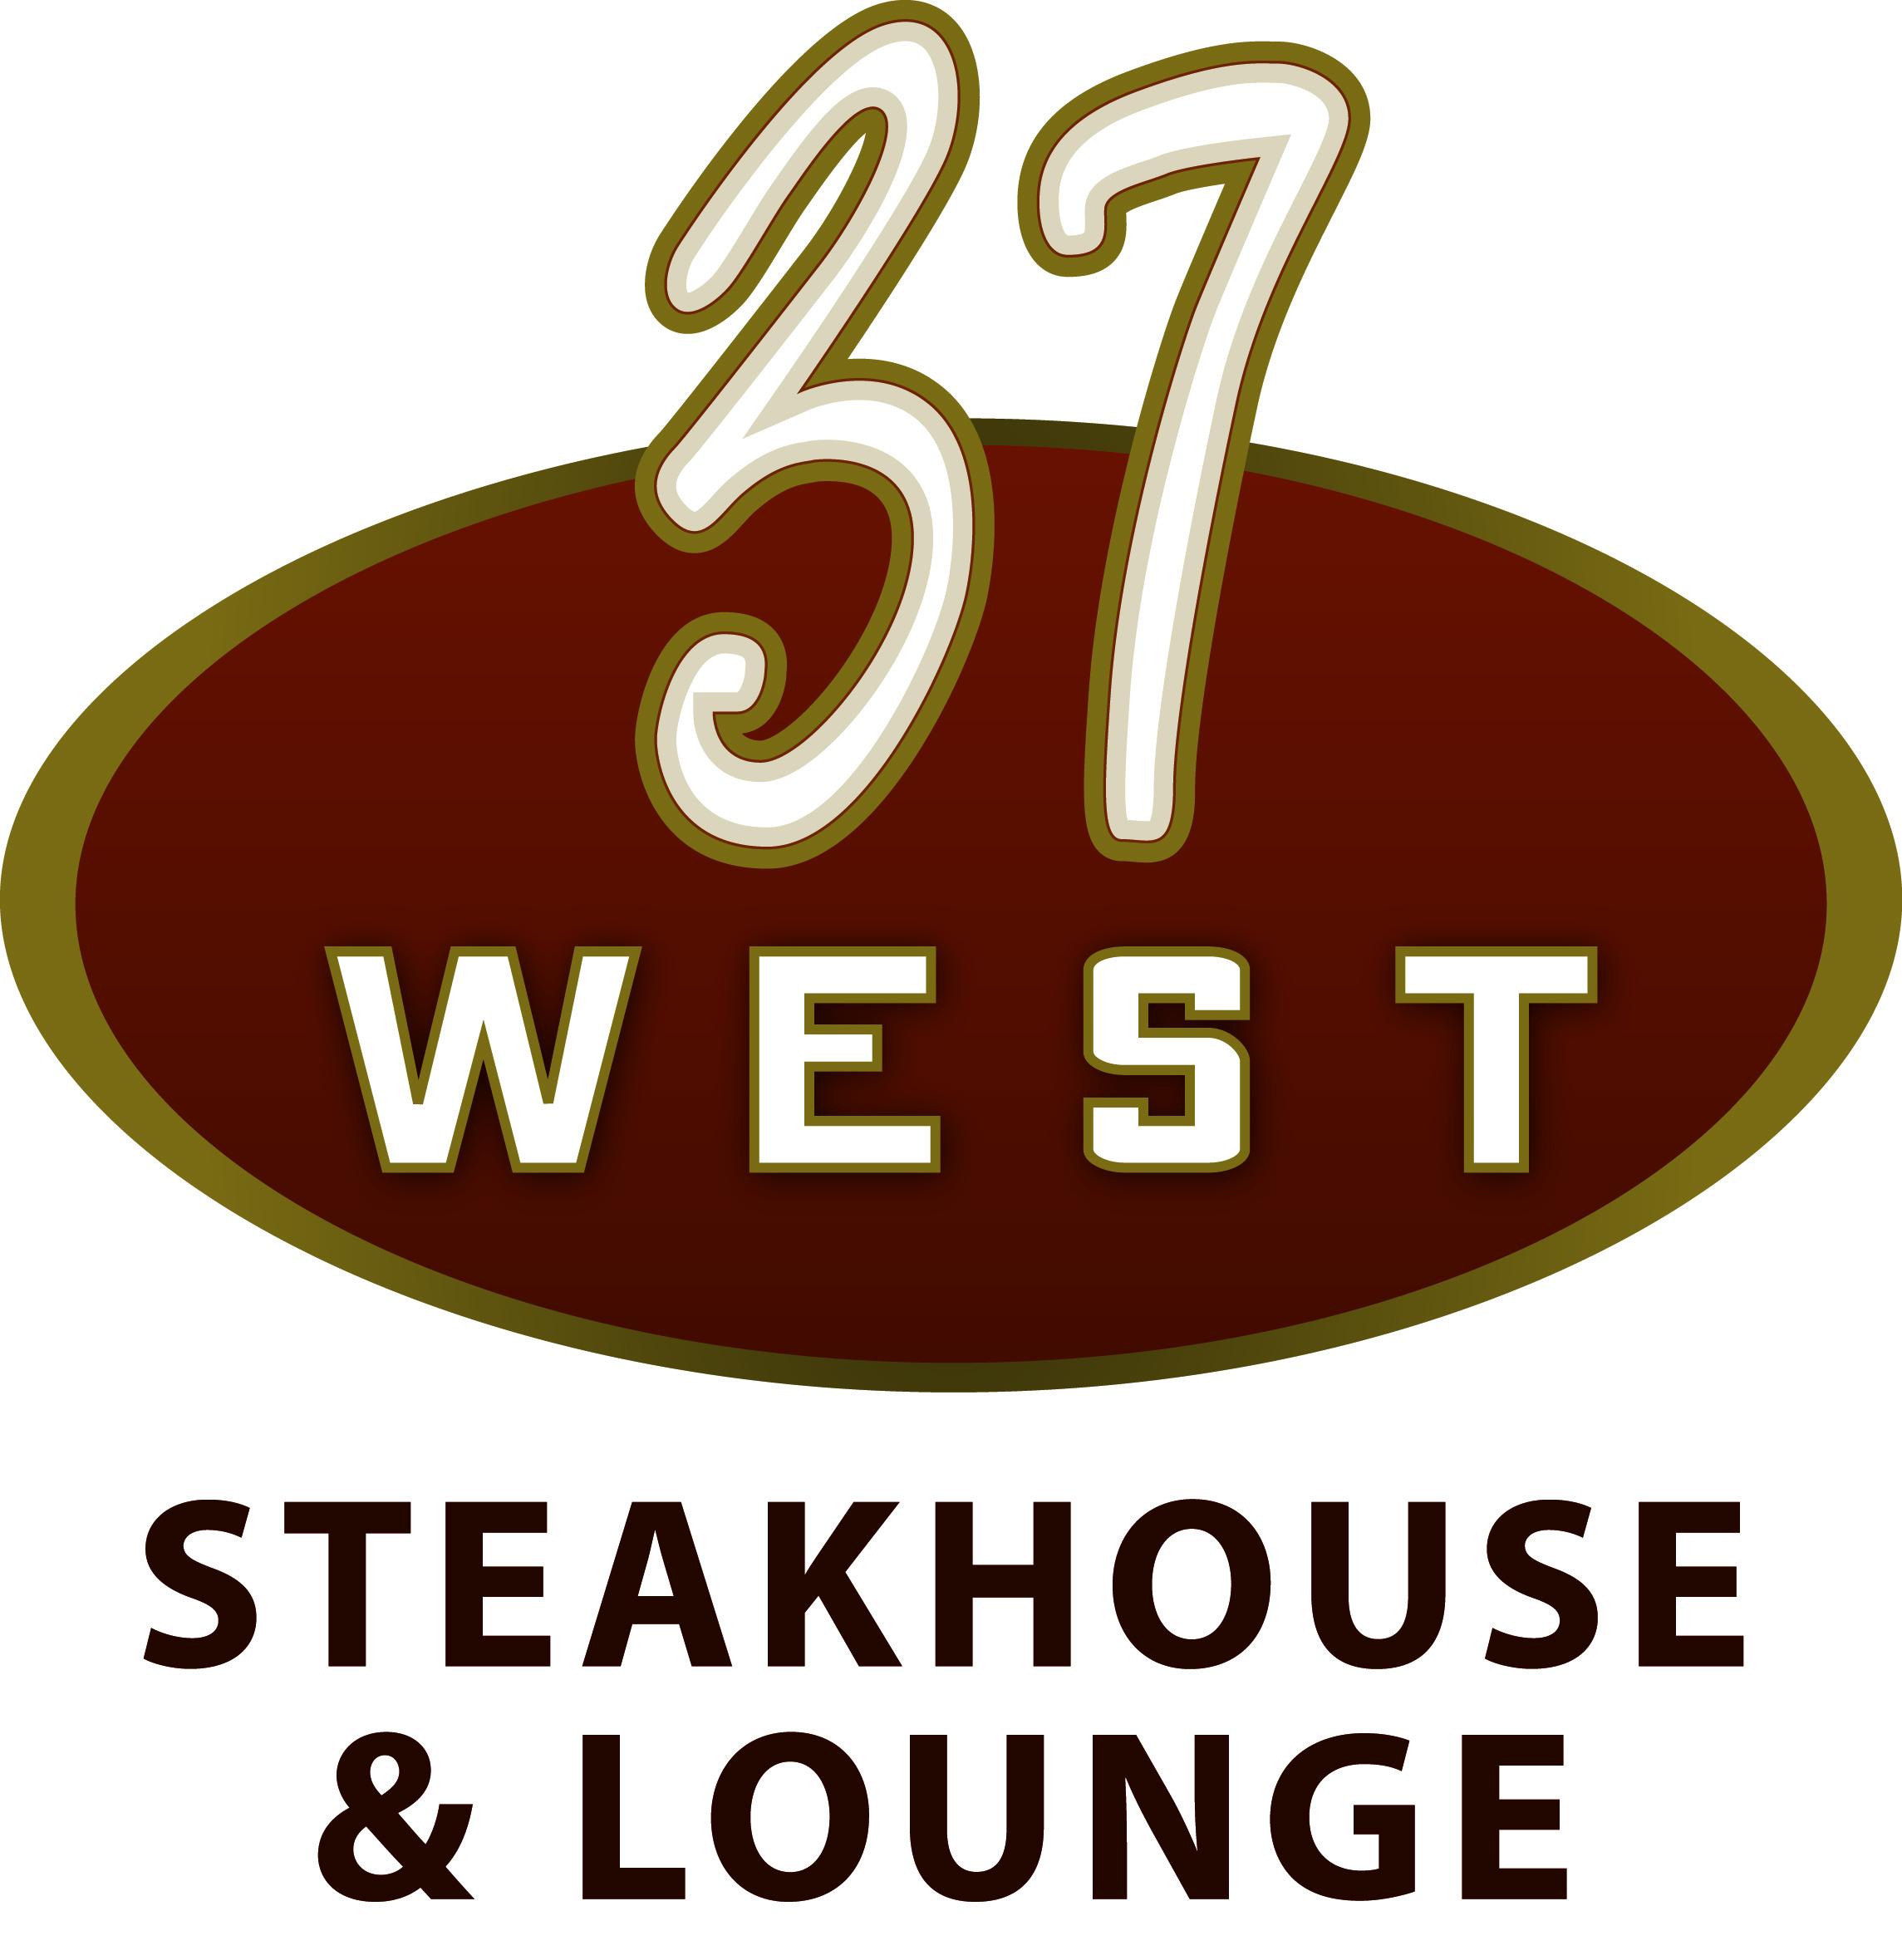 37 West